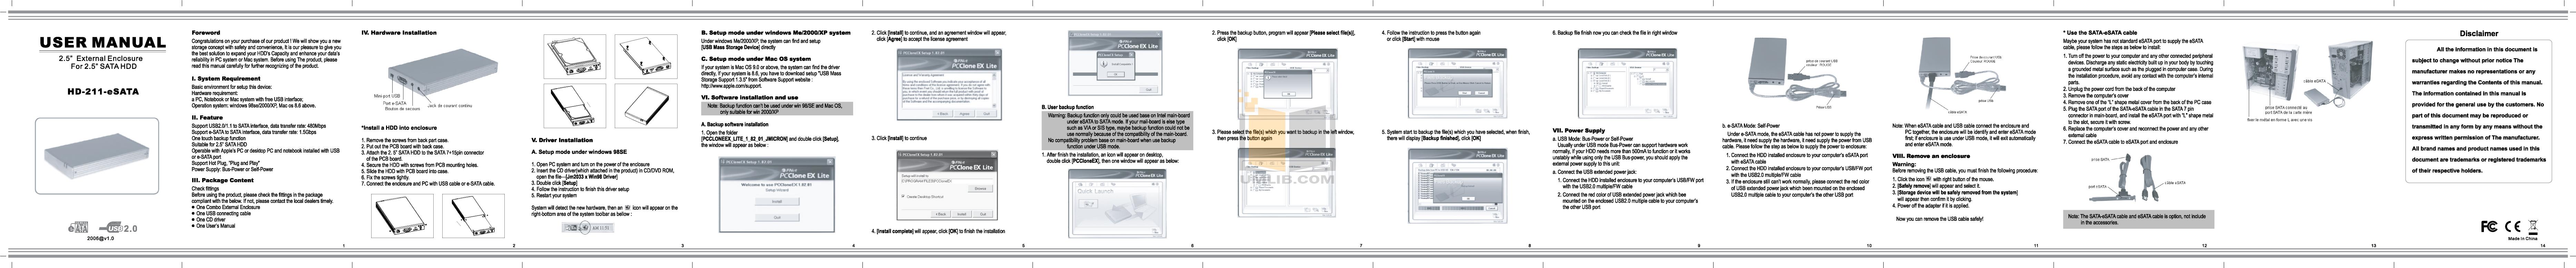 pdf for Coolmax Storage HD-211-eSATA manual